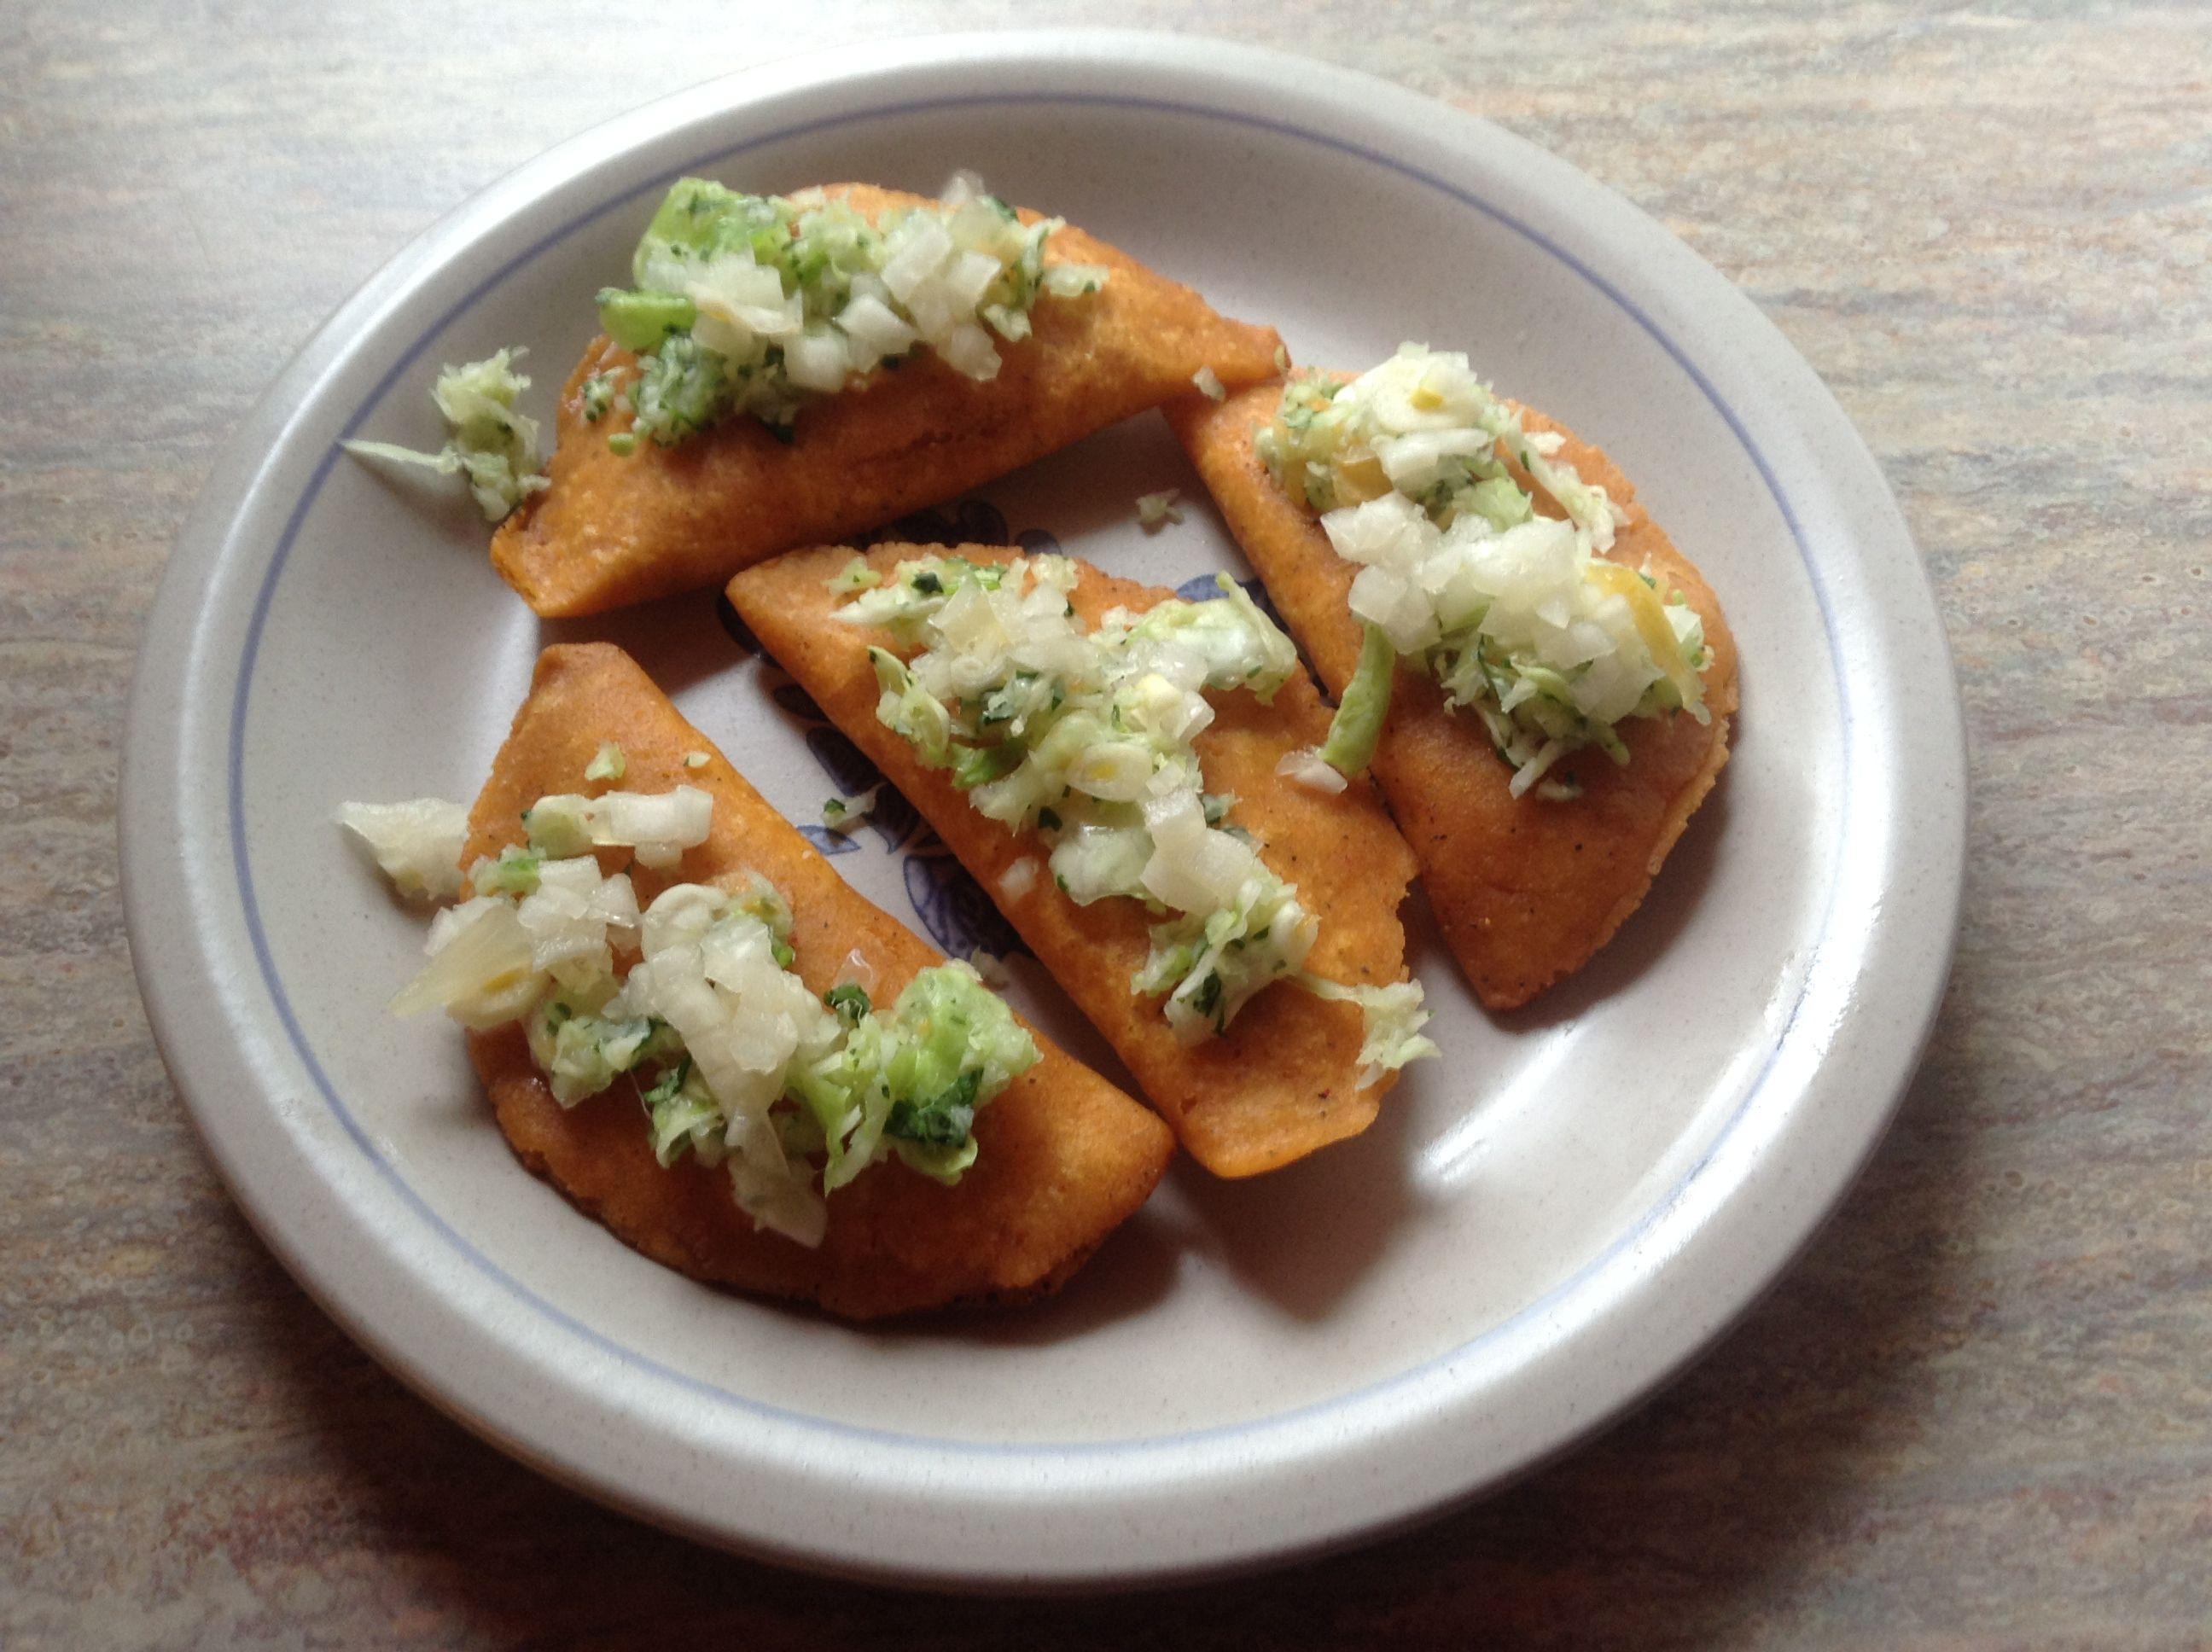 Panades - Belizean food | Food | Pinterest | Belize, Food ...